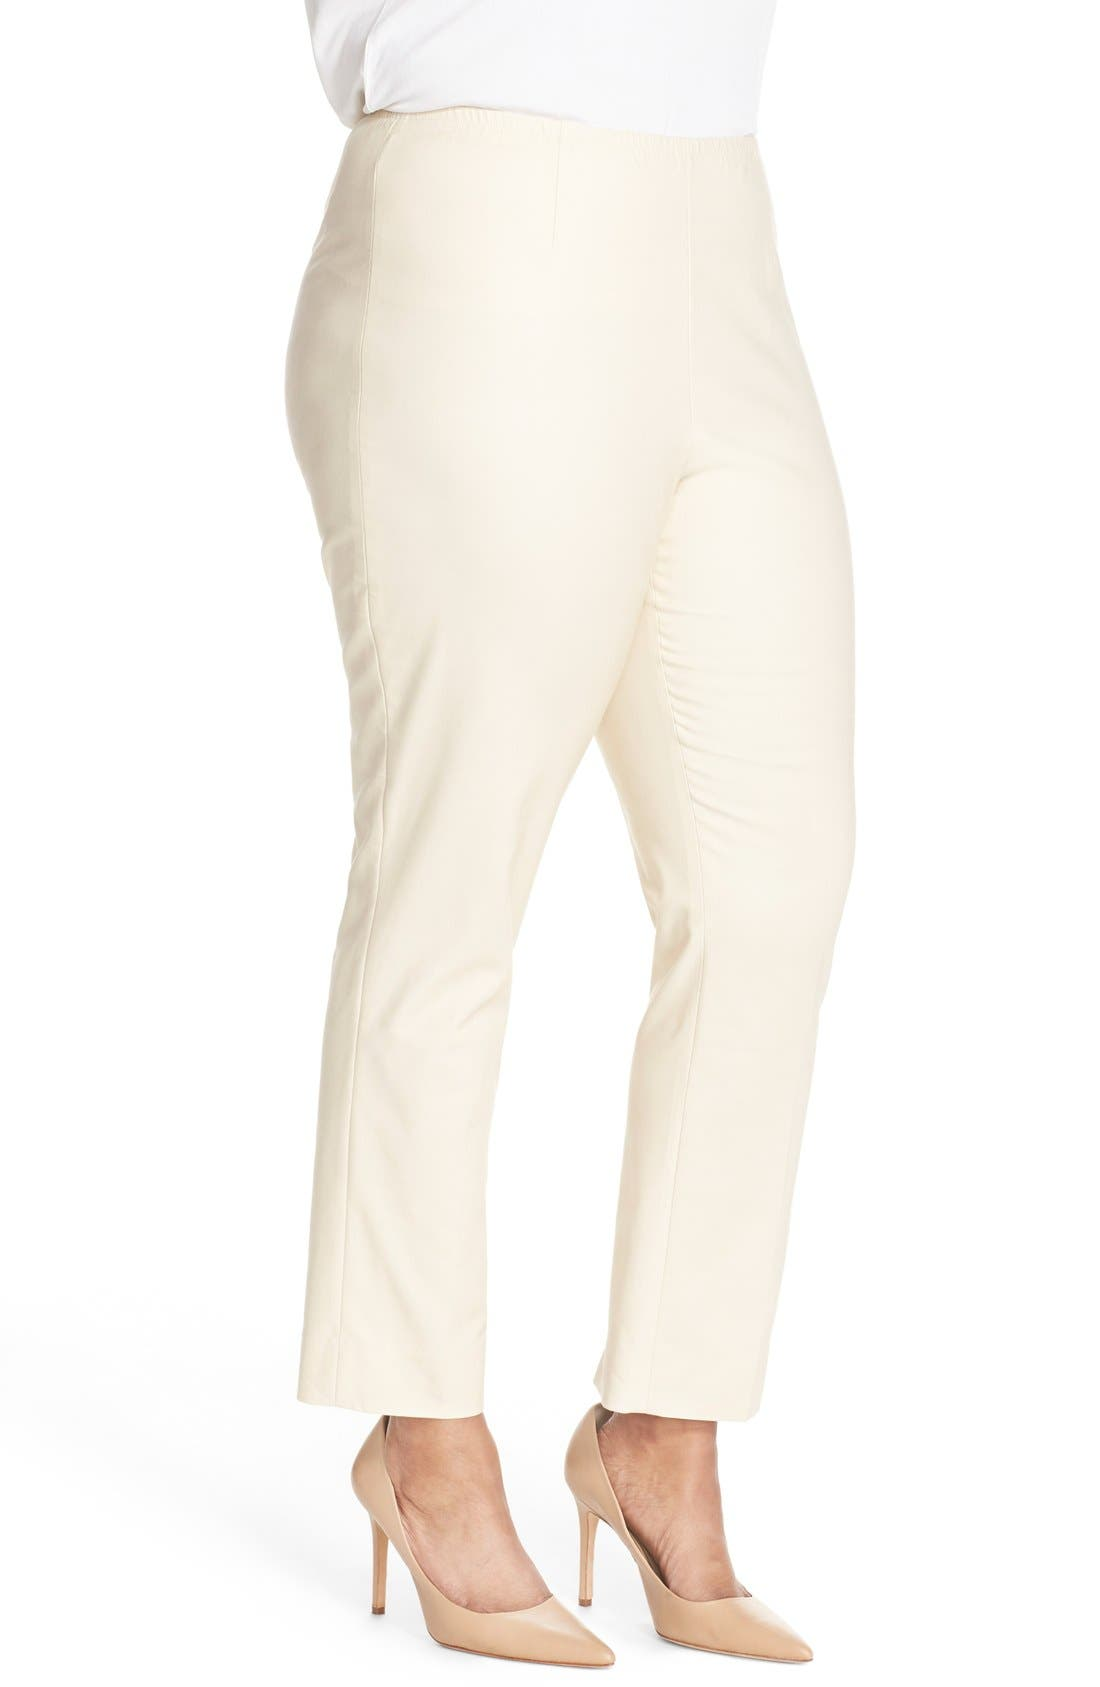 'Perfect' High Rise Side Zip Pants,                             Alternate thumbnail 3, color,                             SANDSHELL